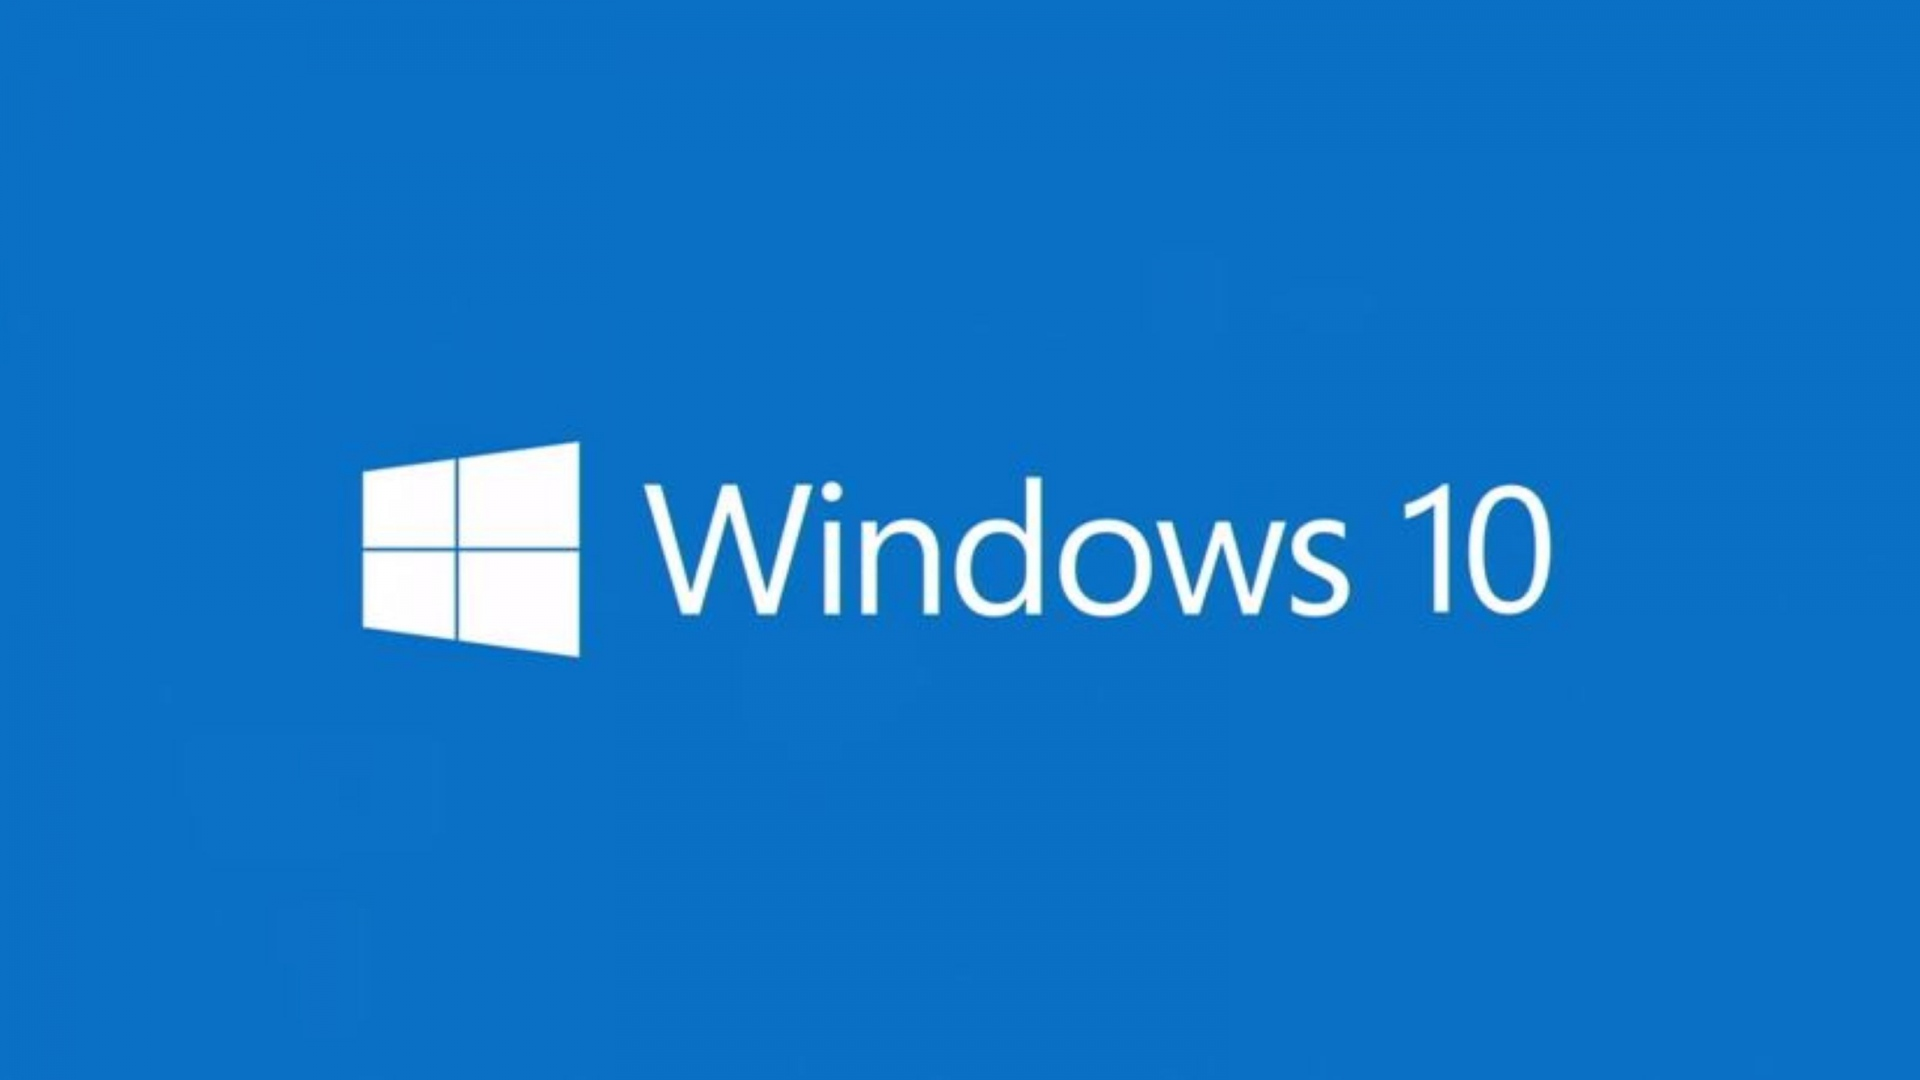 Download Wallpaper 1920x1080 Windows 10 technical preview Windows 10 1920x1080